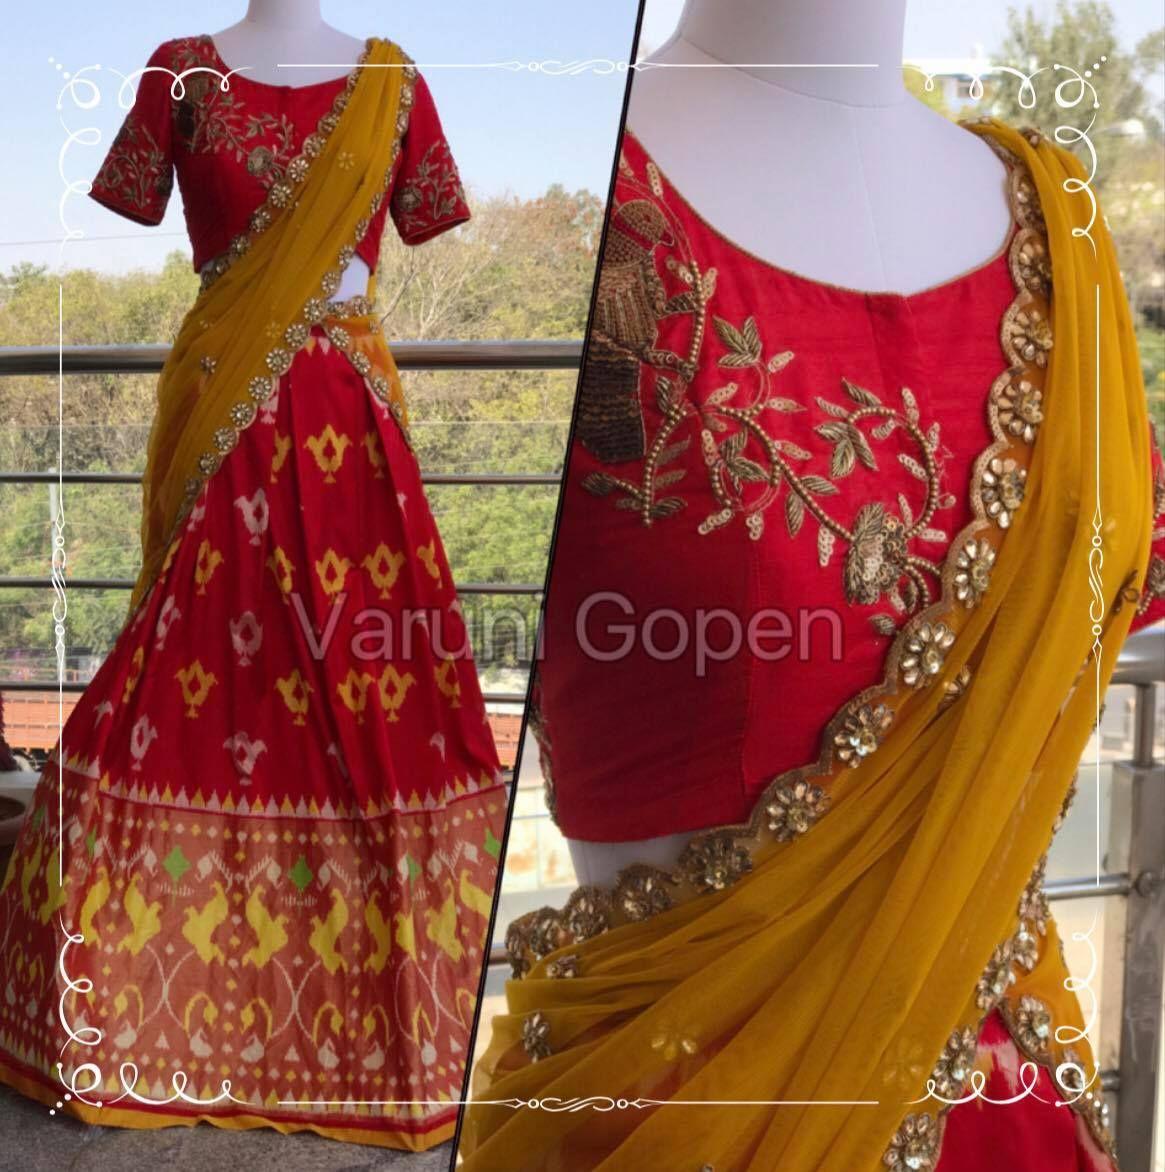 Ikkat lehenga for this wedding seasonFor more detailsMail varunigopen@gmail.comWhatsApp 9849125889  07 March 2017